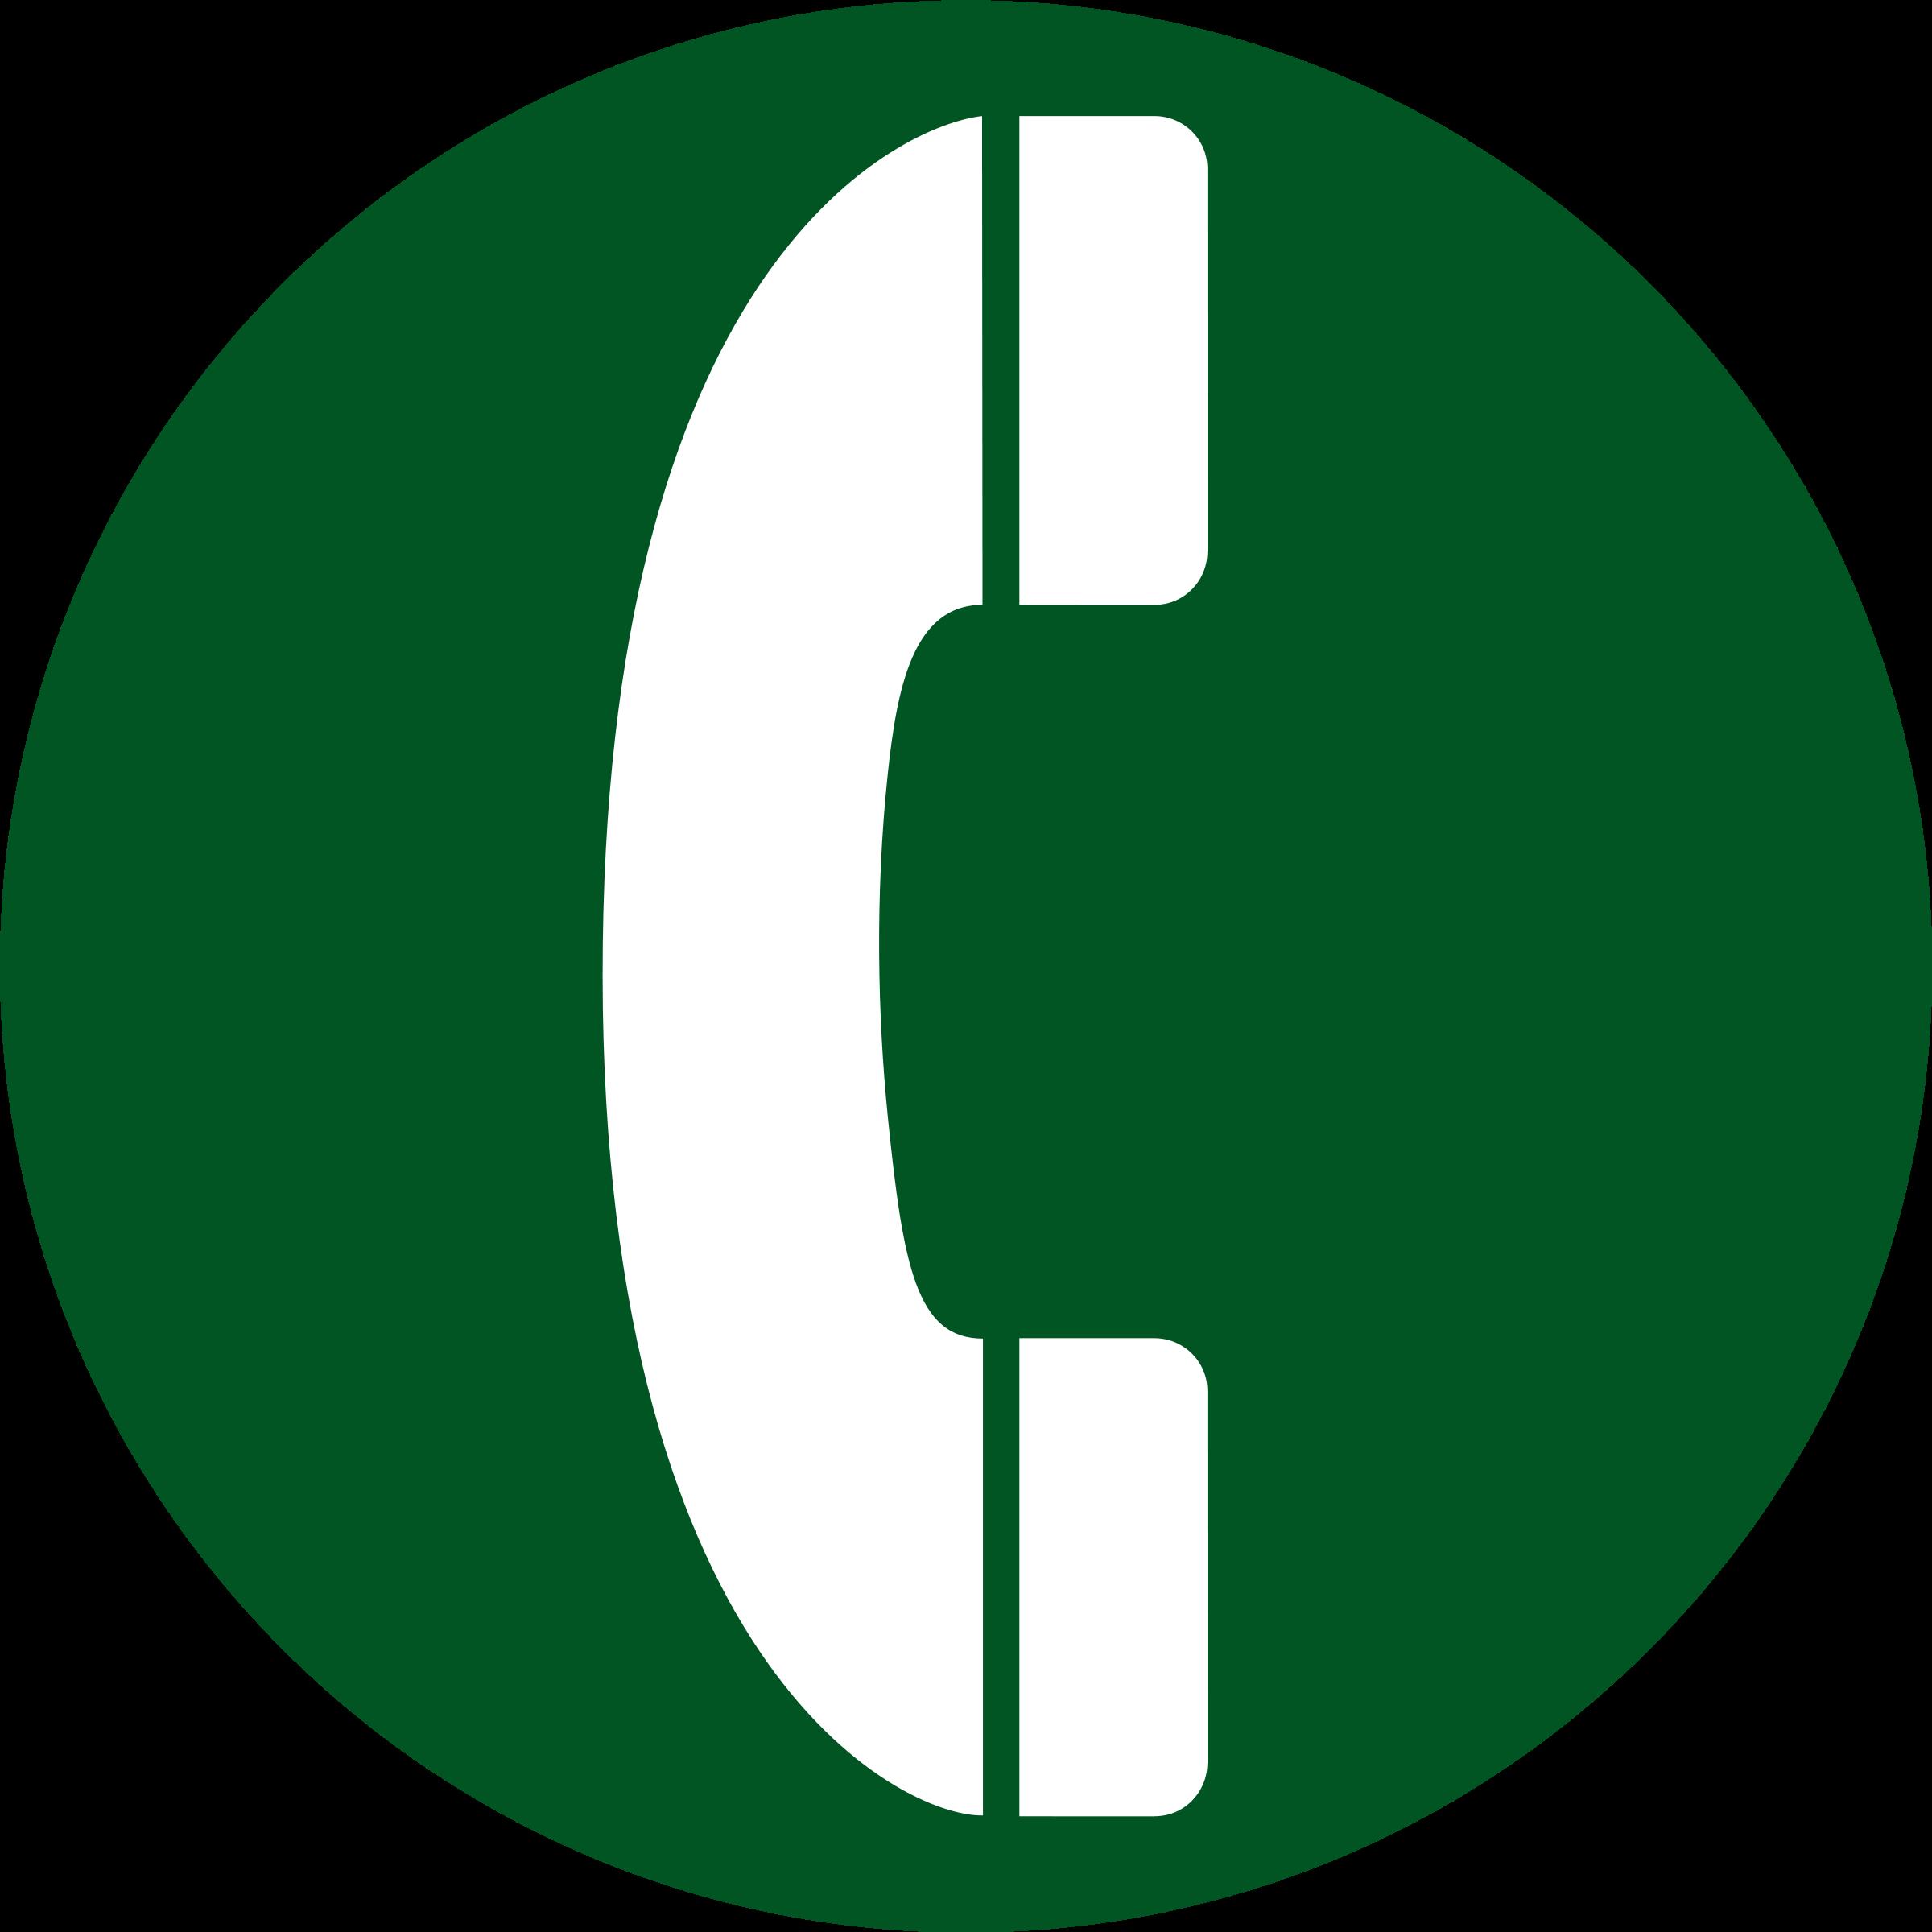 Telephone Images Free.